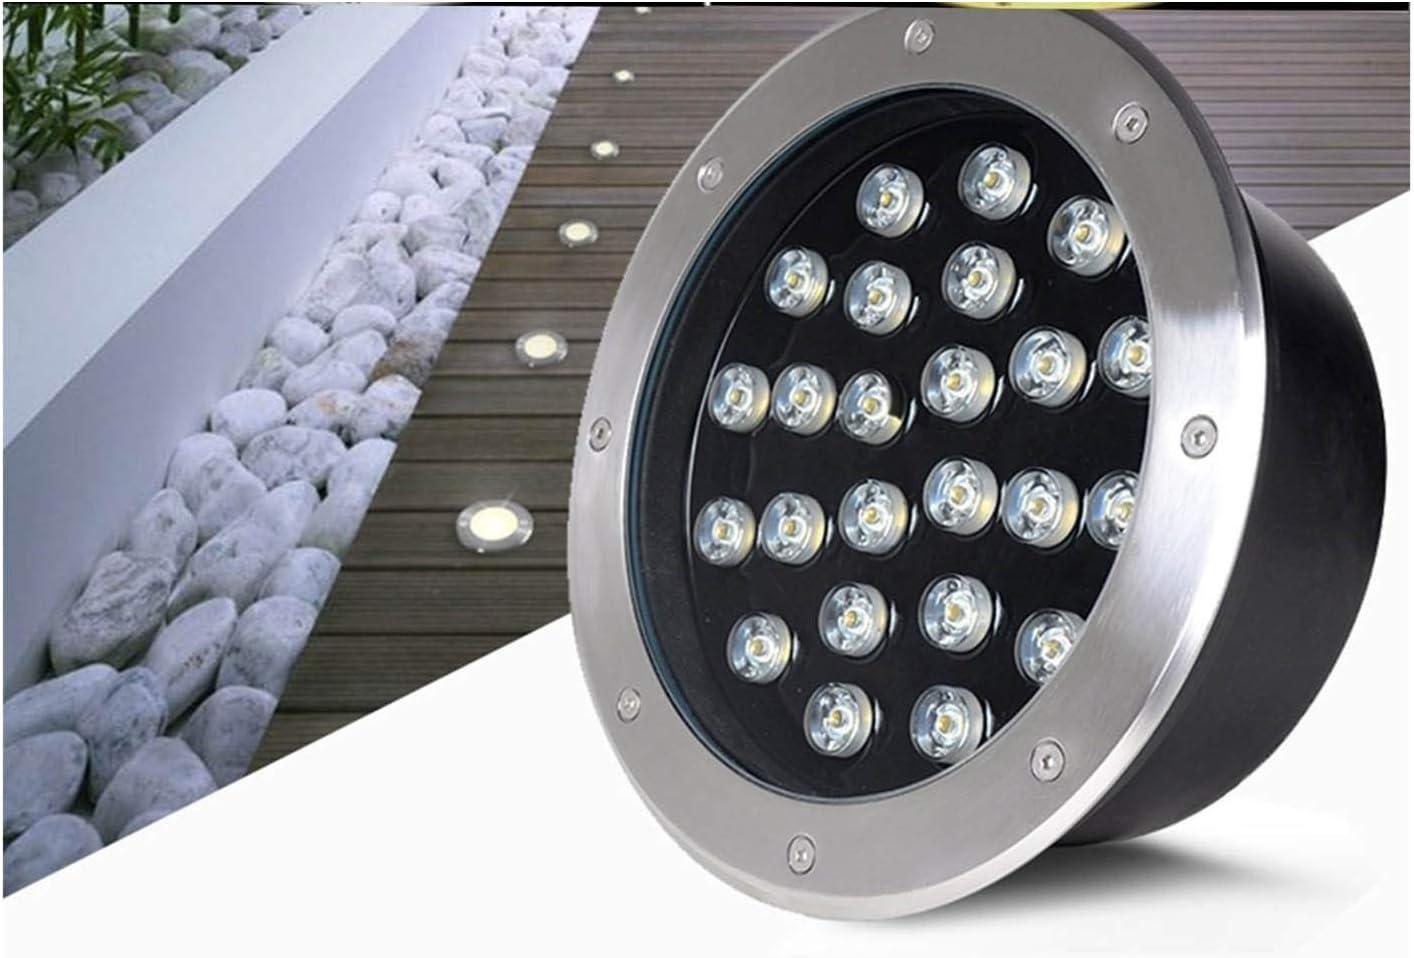 ZWYSL LED Low Ground Light Underground OFFer Thin L trust Inground Led